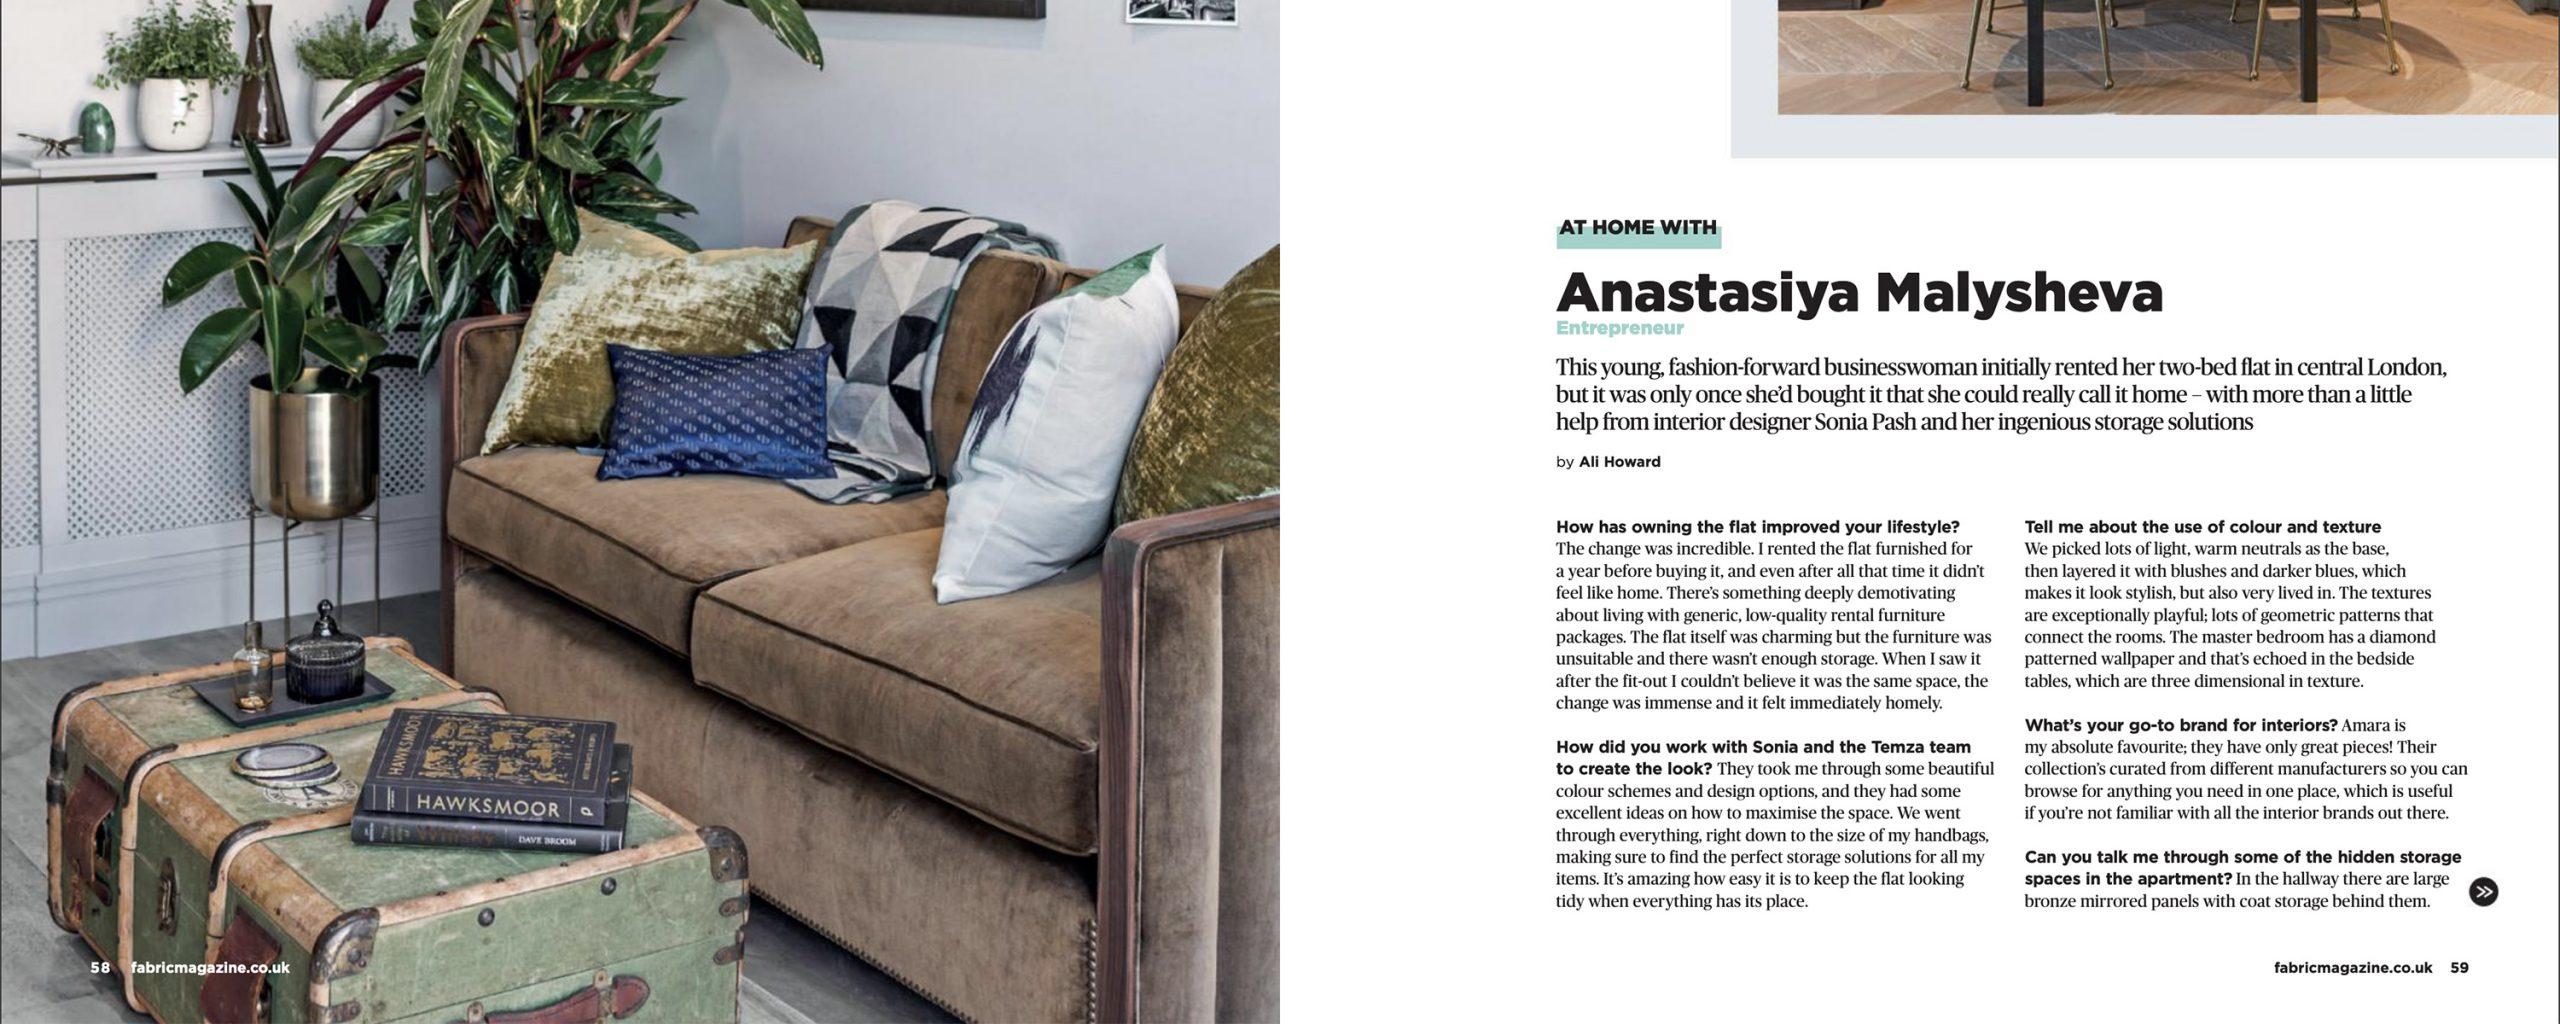 temza design and build studio for Fabric magazine1